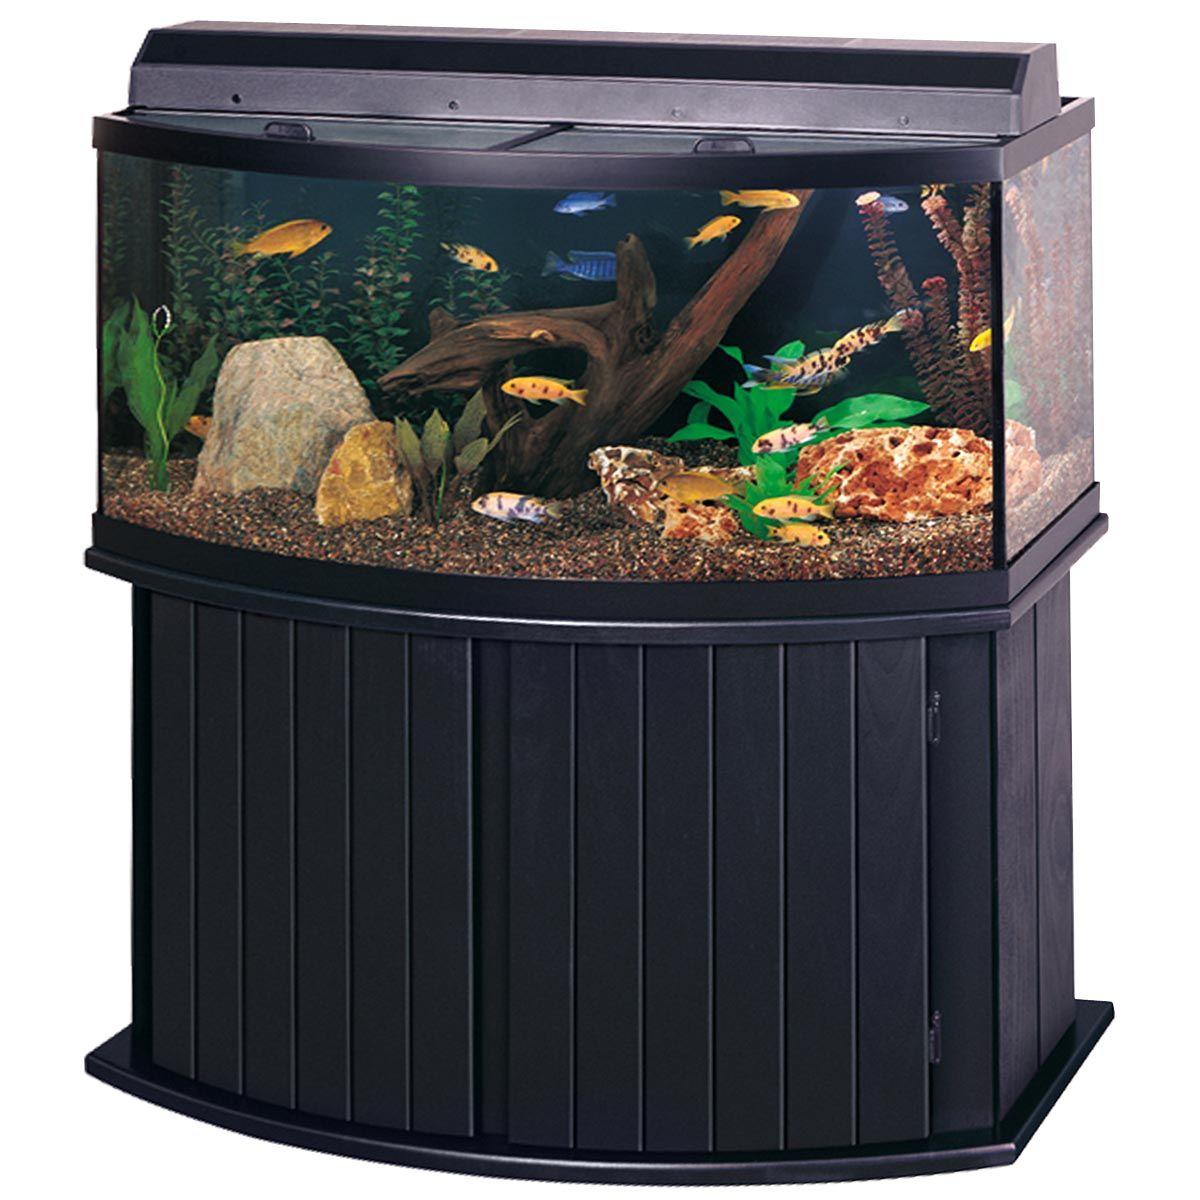 100 gallon glass bow front aquarium aquarium ideas for Bow front fish tank